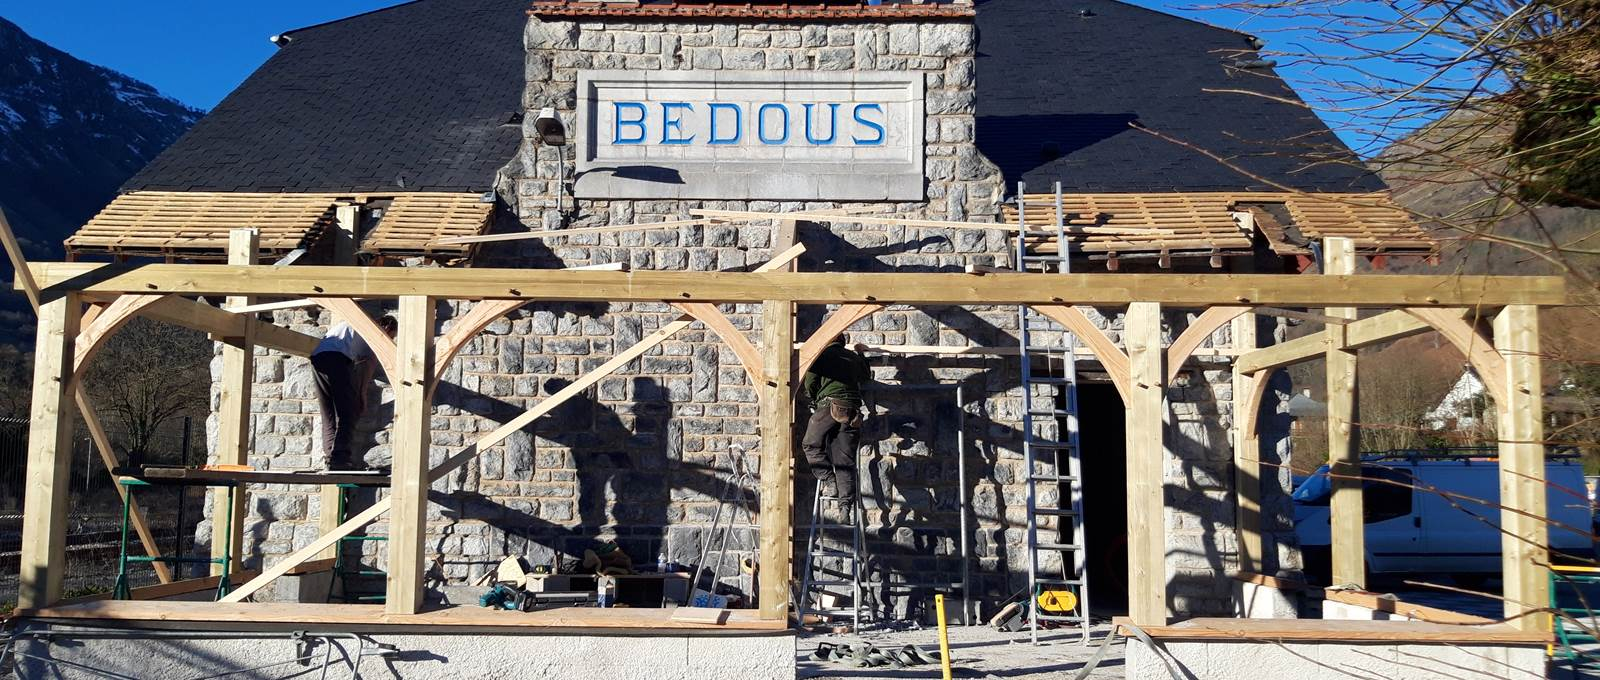 hotel Bedous - gare - veranda